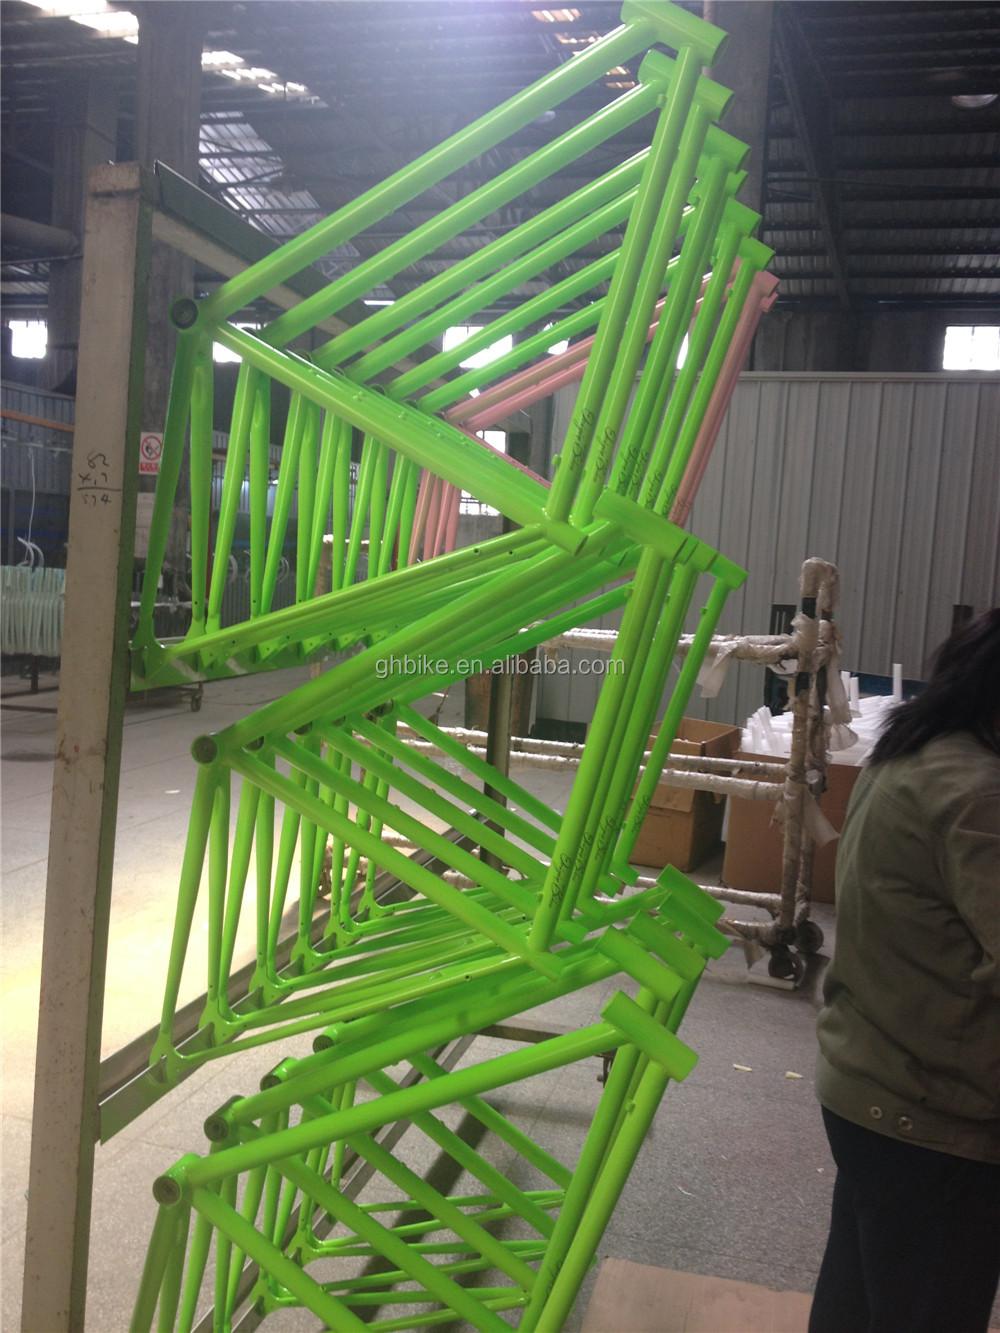 Oem Bunte Fixie Fahrrad Fixie Rahmen Festrad Frameset - Buy Product ...